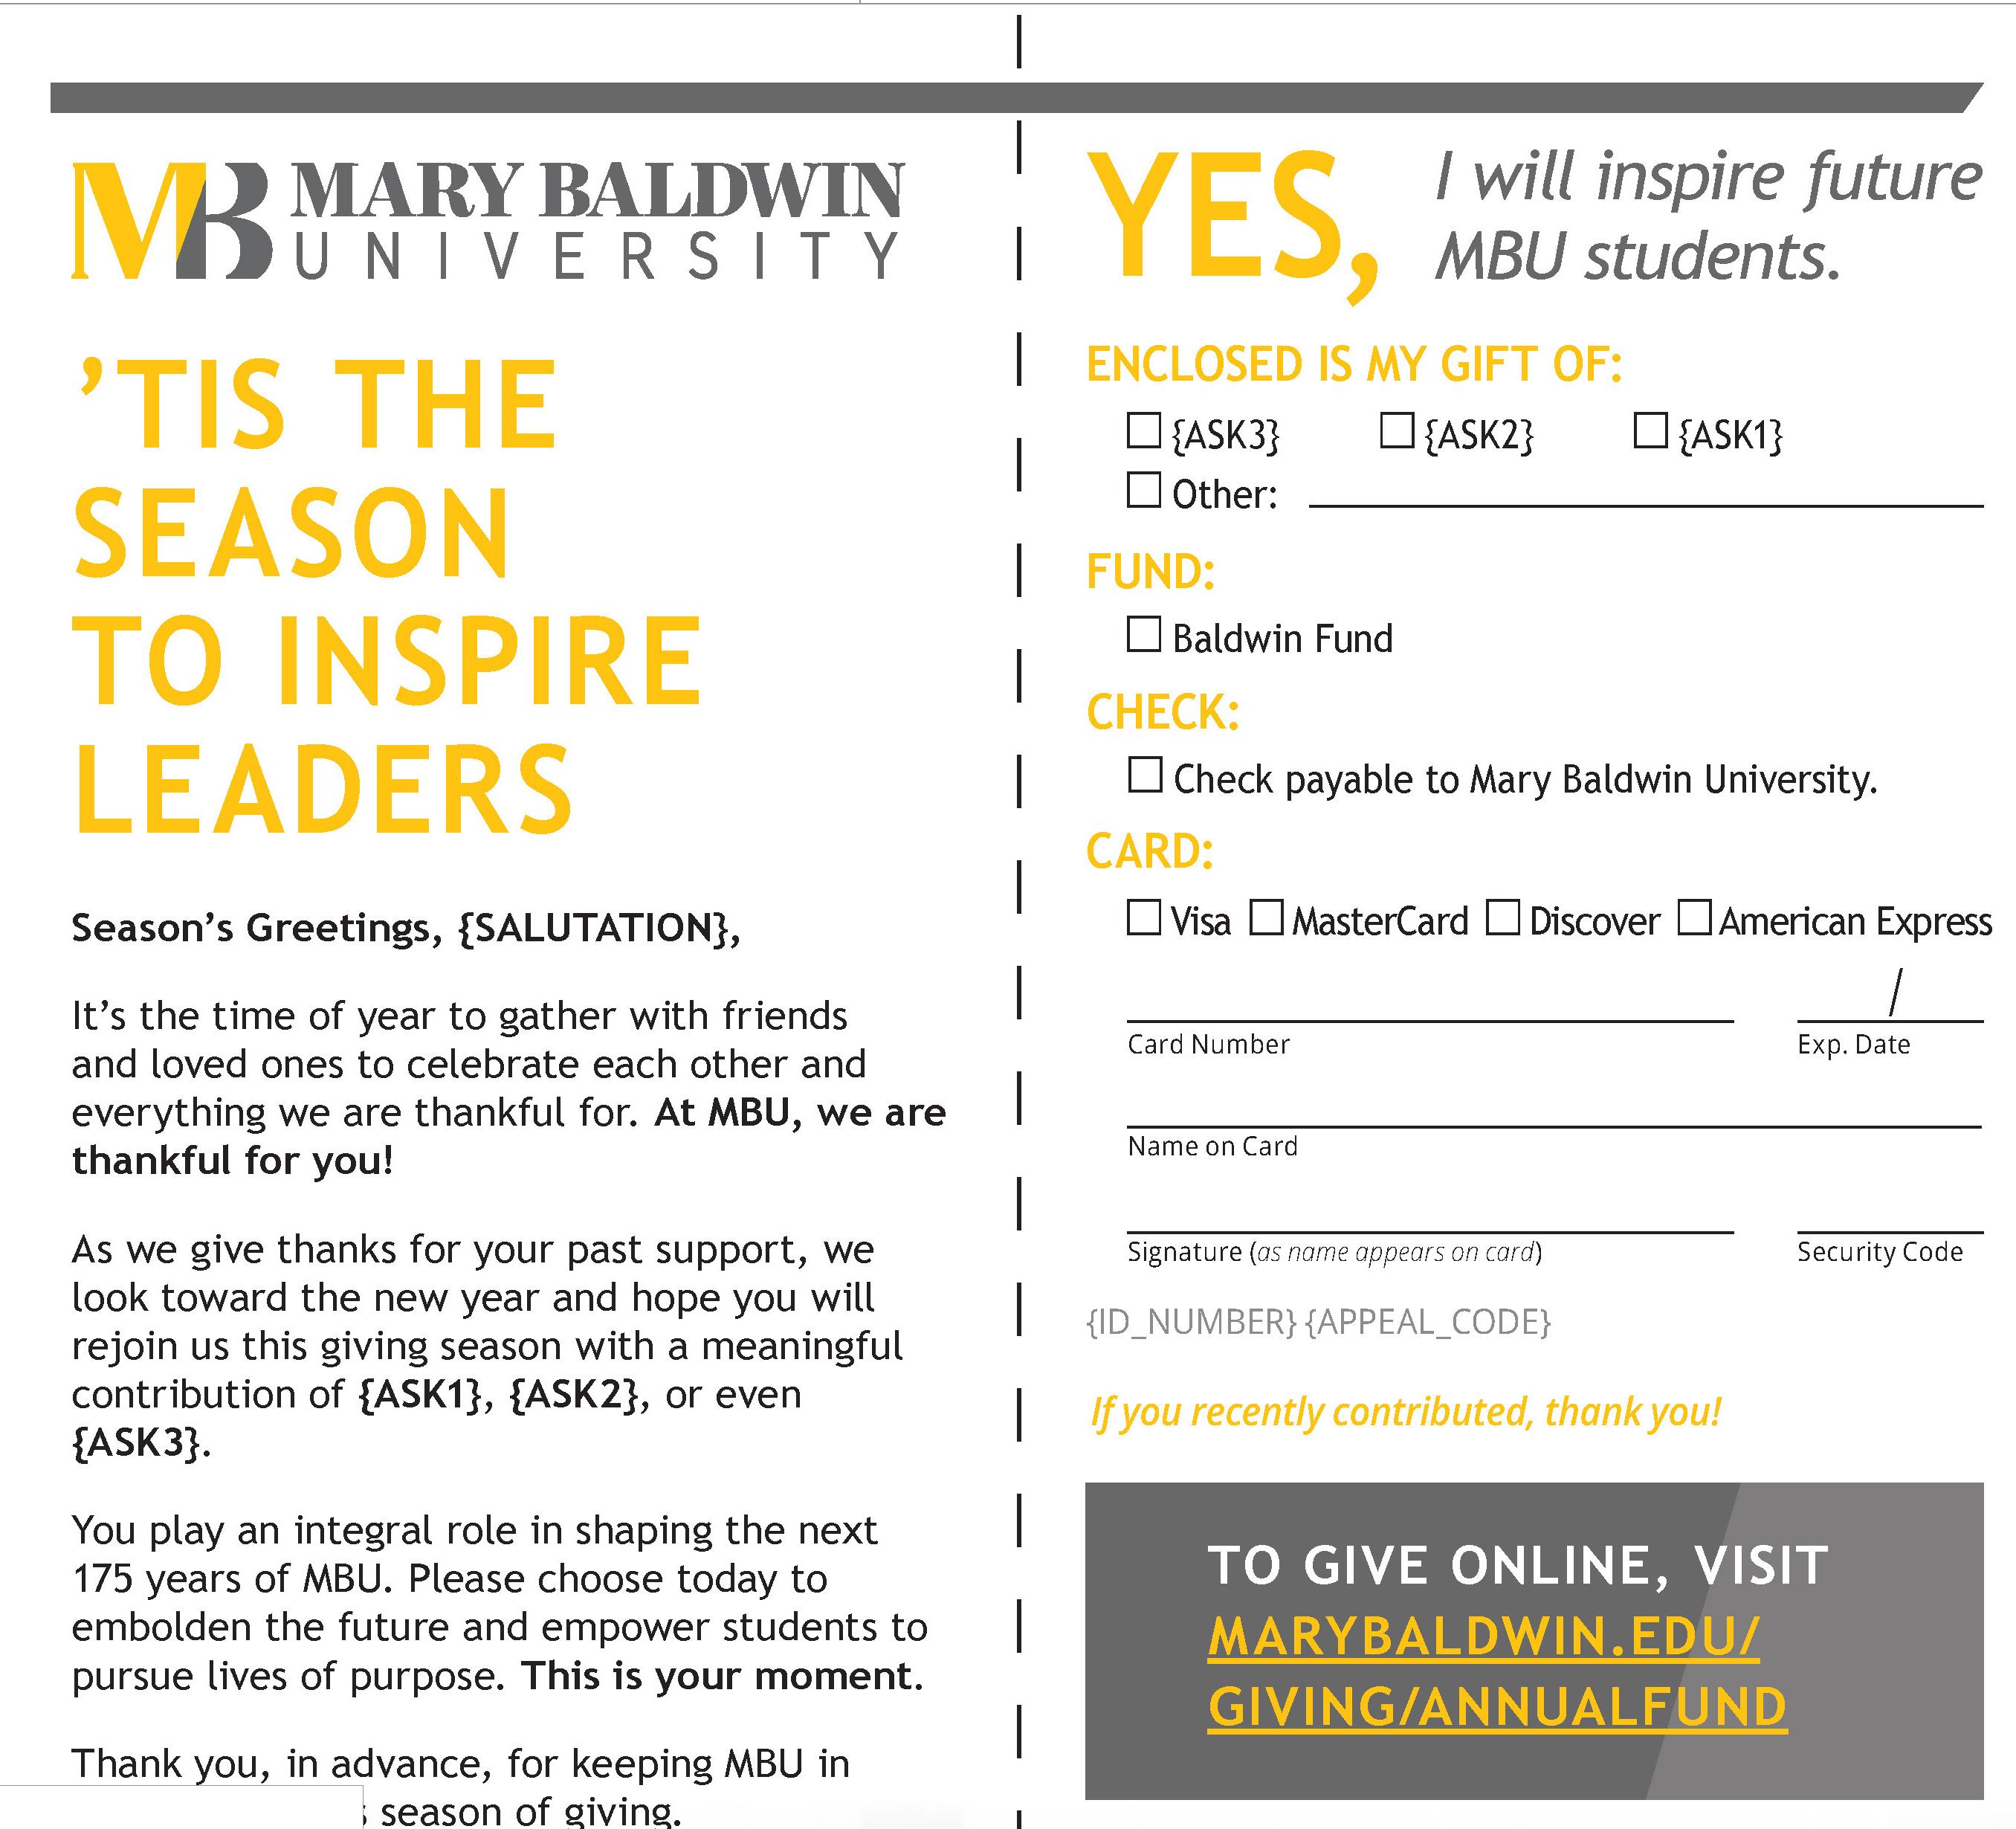 Higher education marketing awards winner: Mary Baldwin University